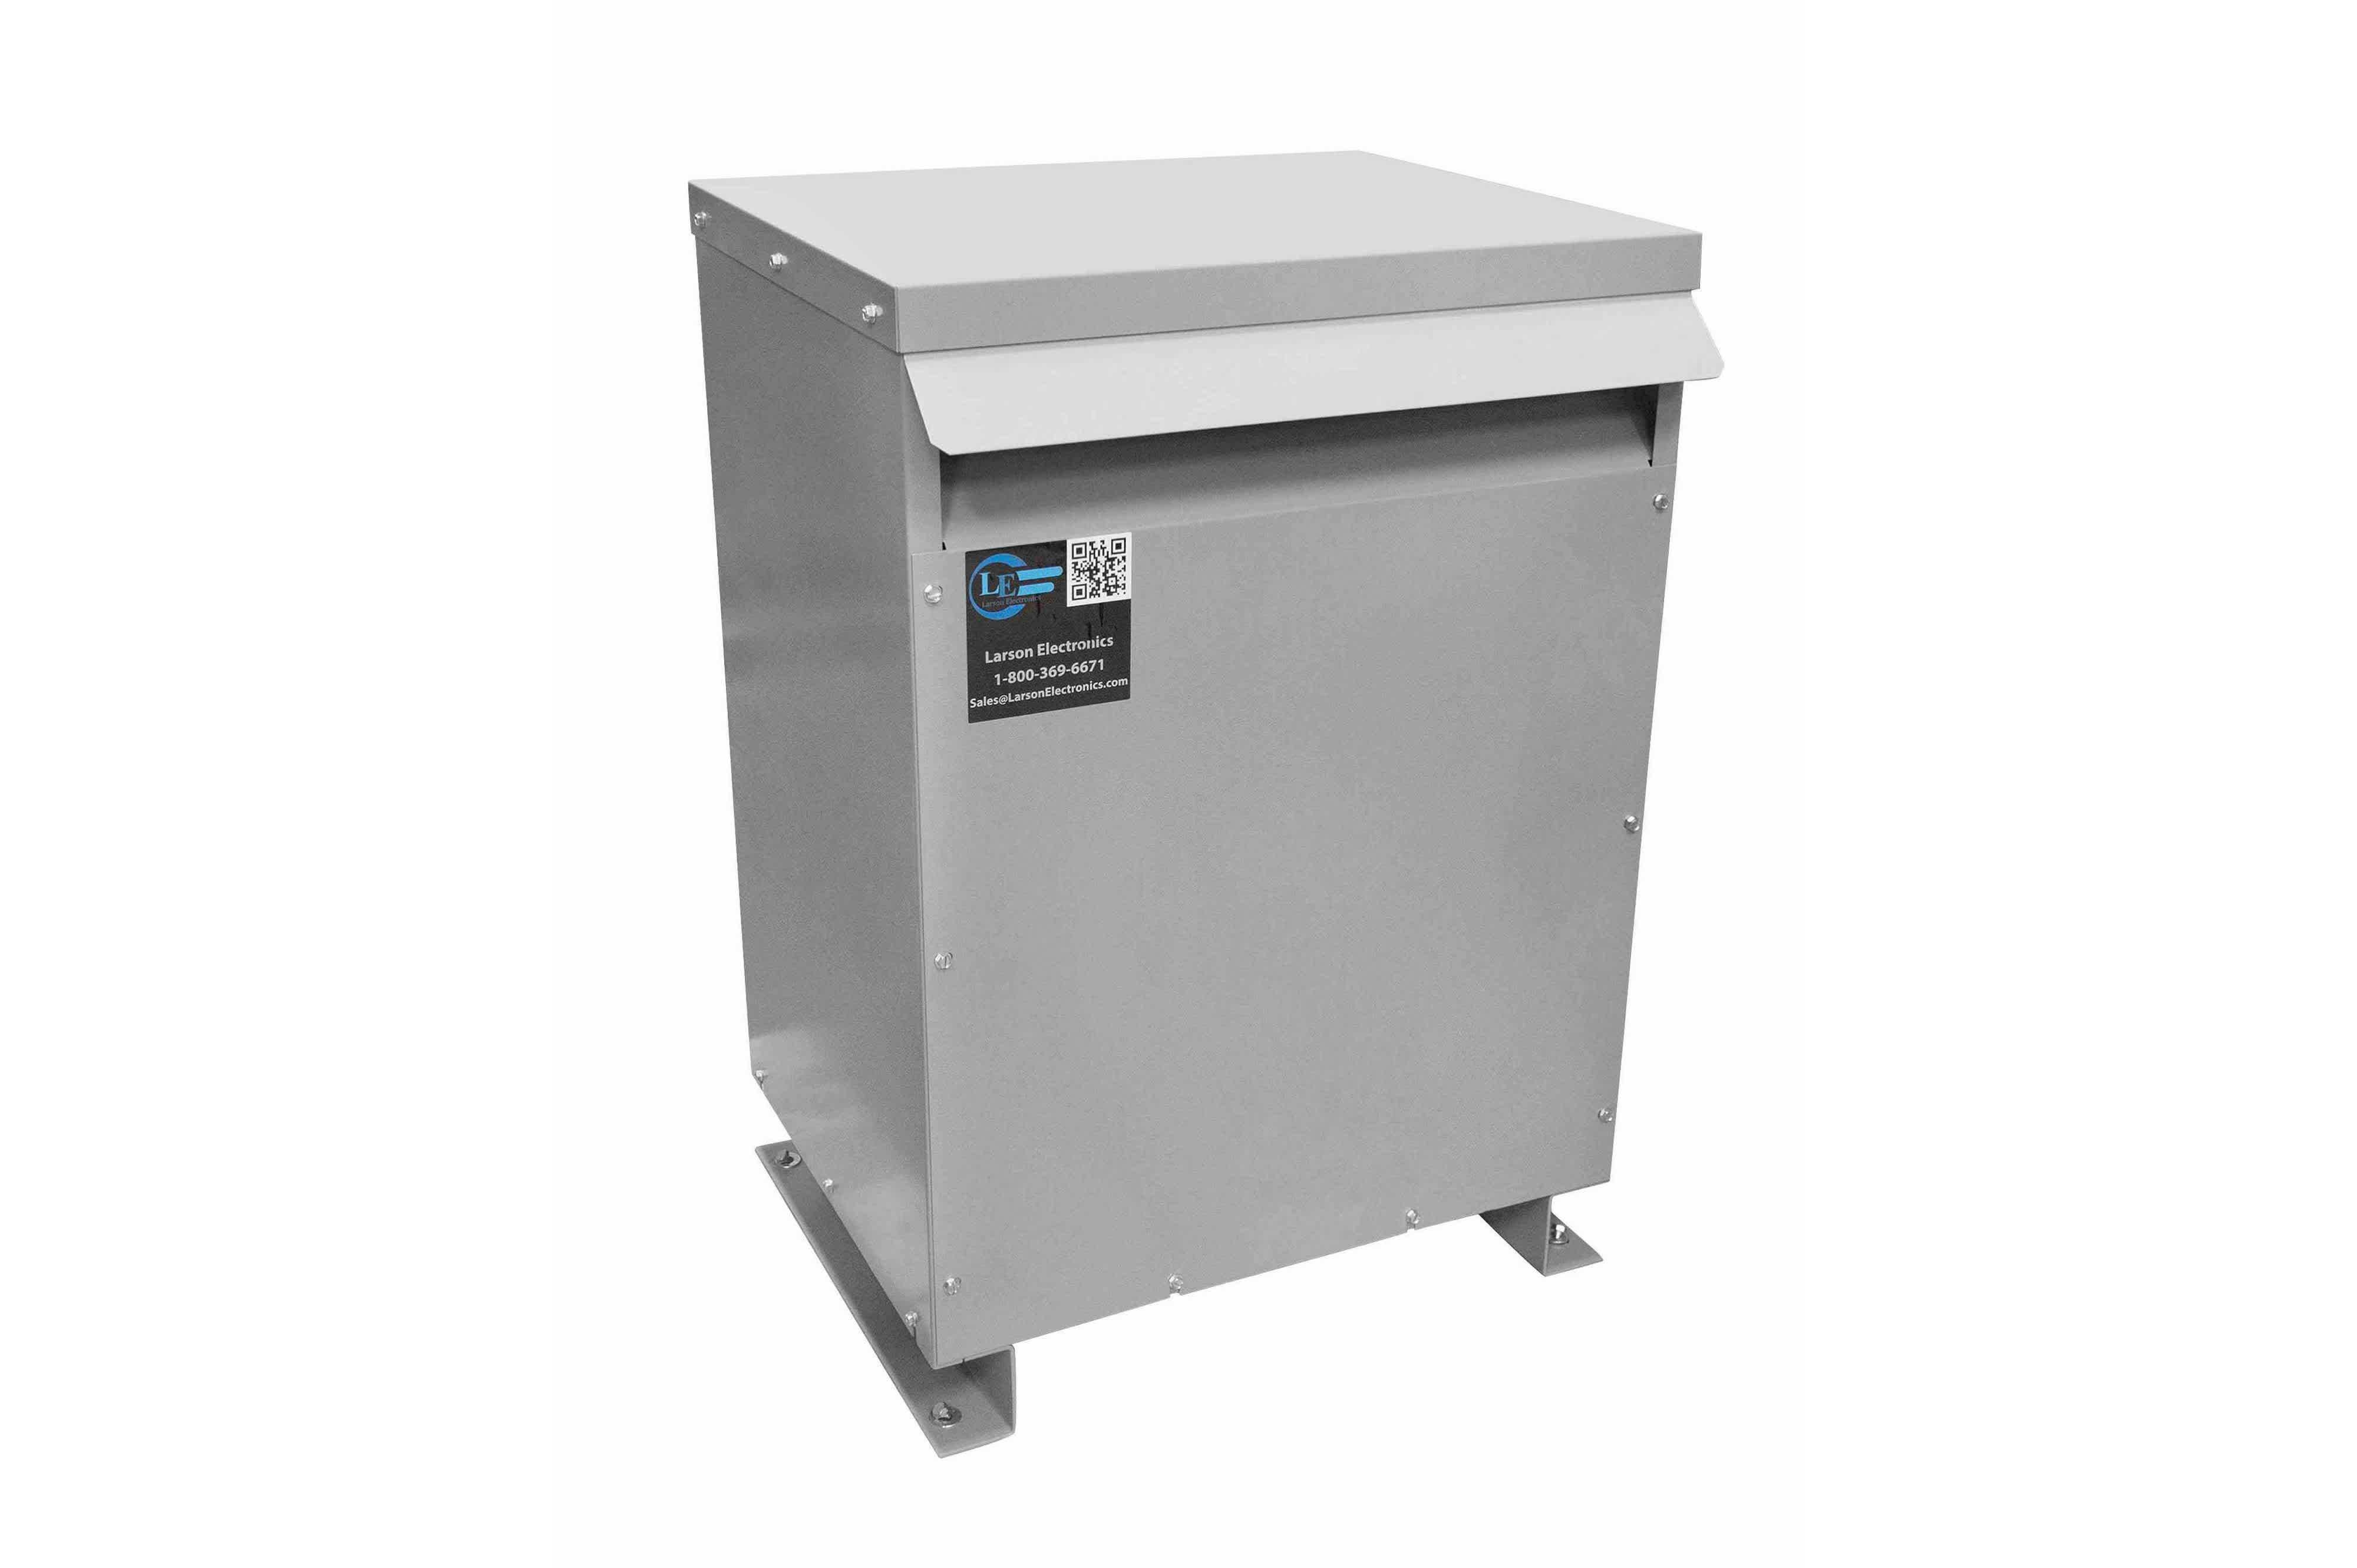 32.5 kVA 3PH Isolation Transformer, 380V Wye Primary, 208V Delta Secondary, N3R, Ventilated, 60 Hz